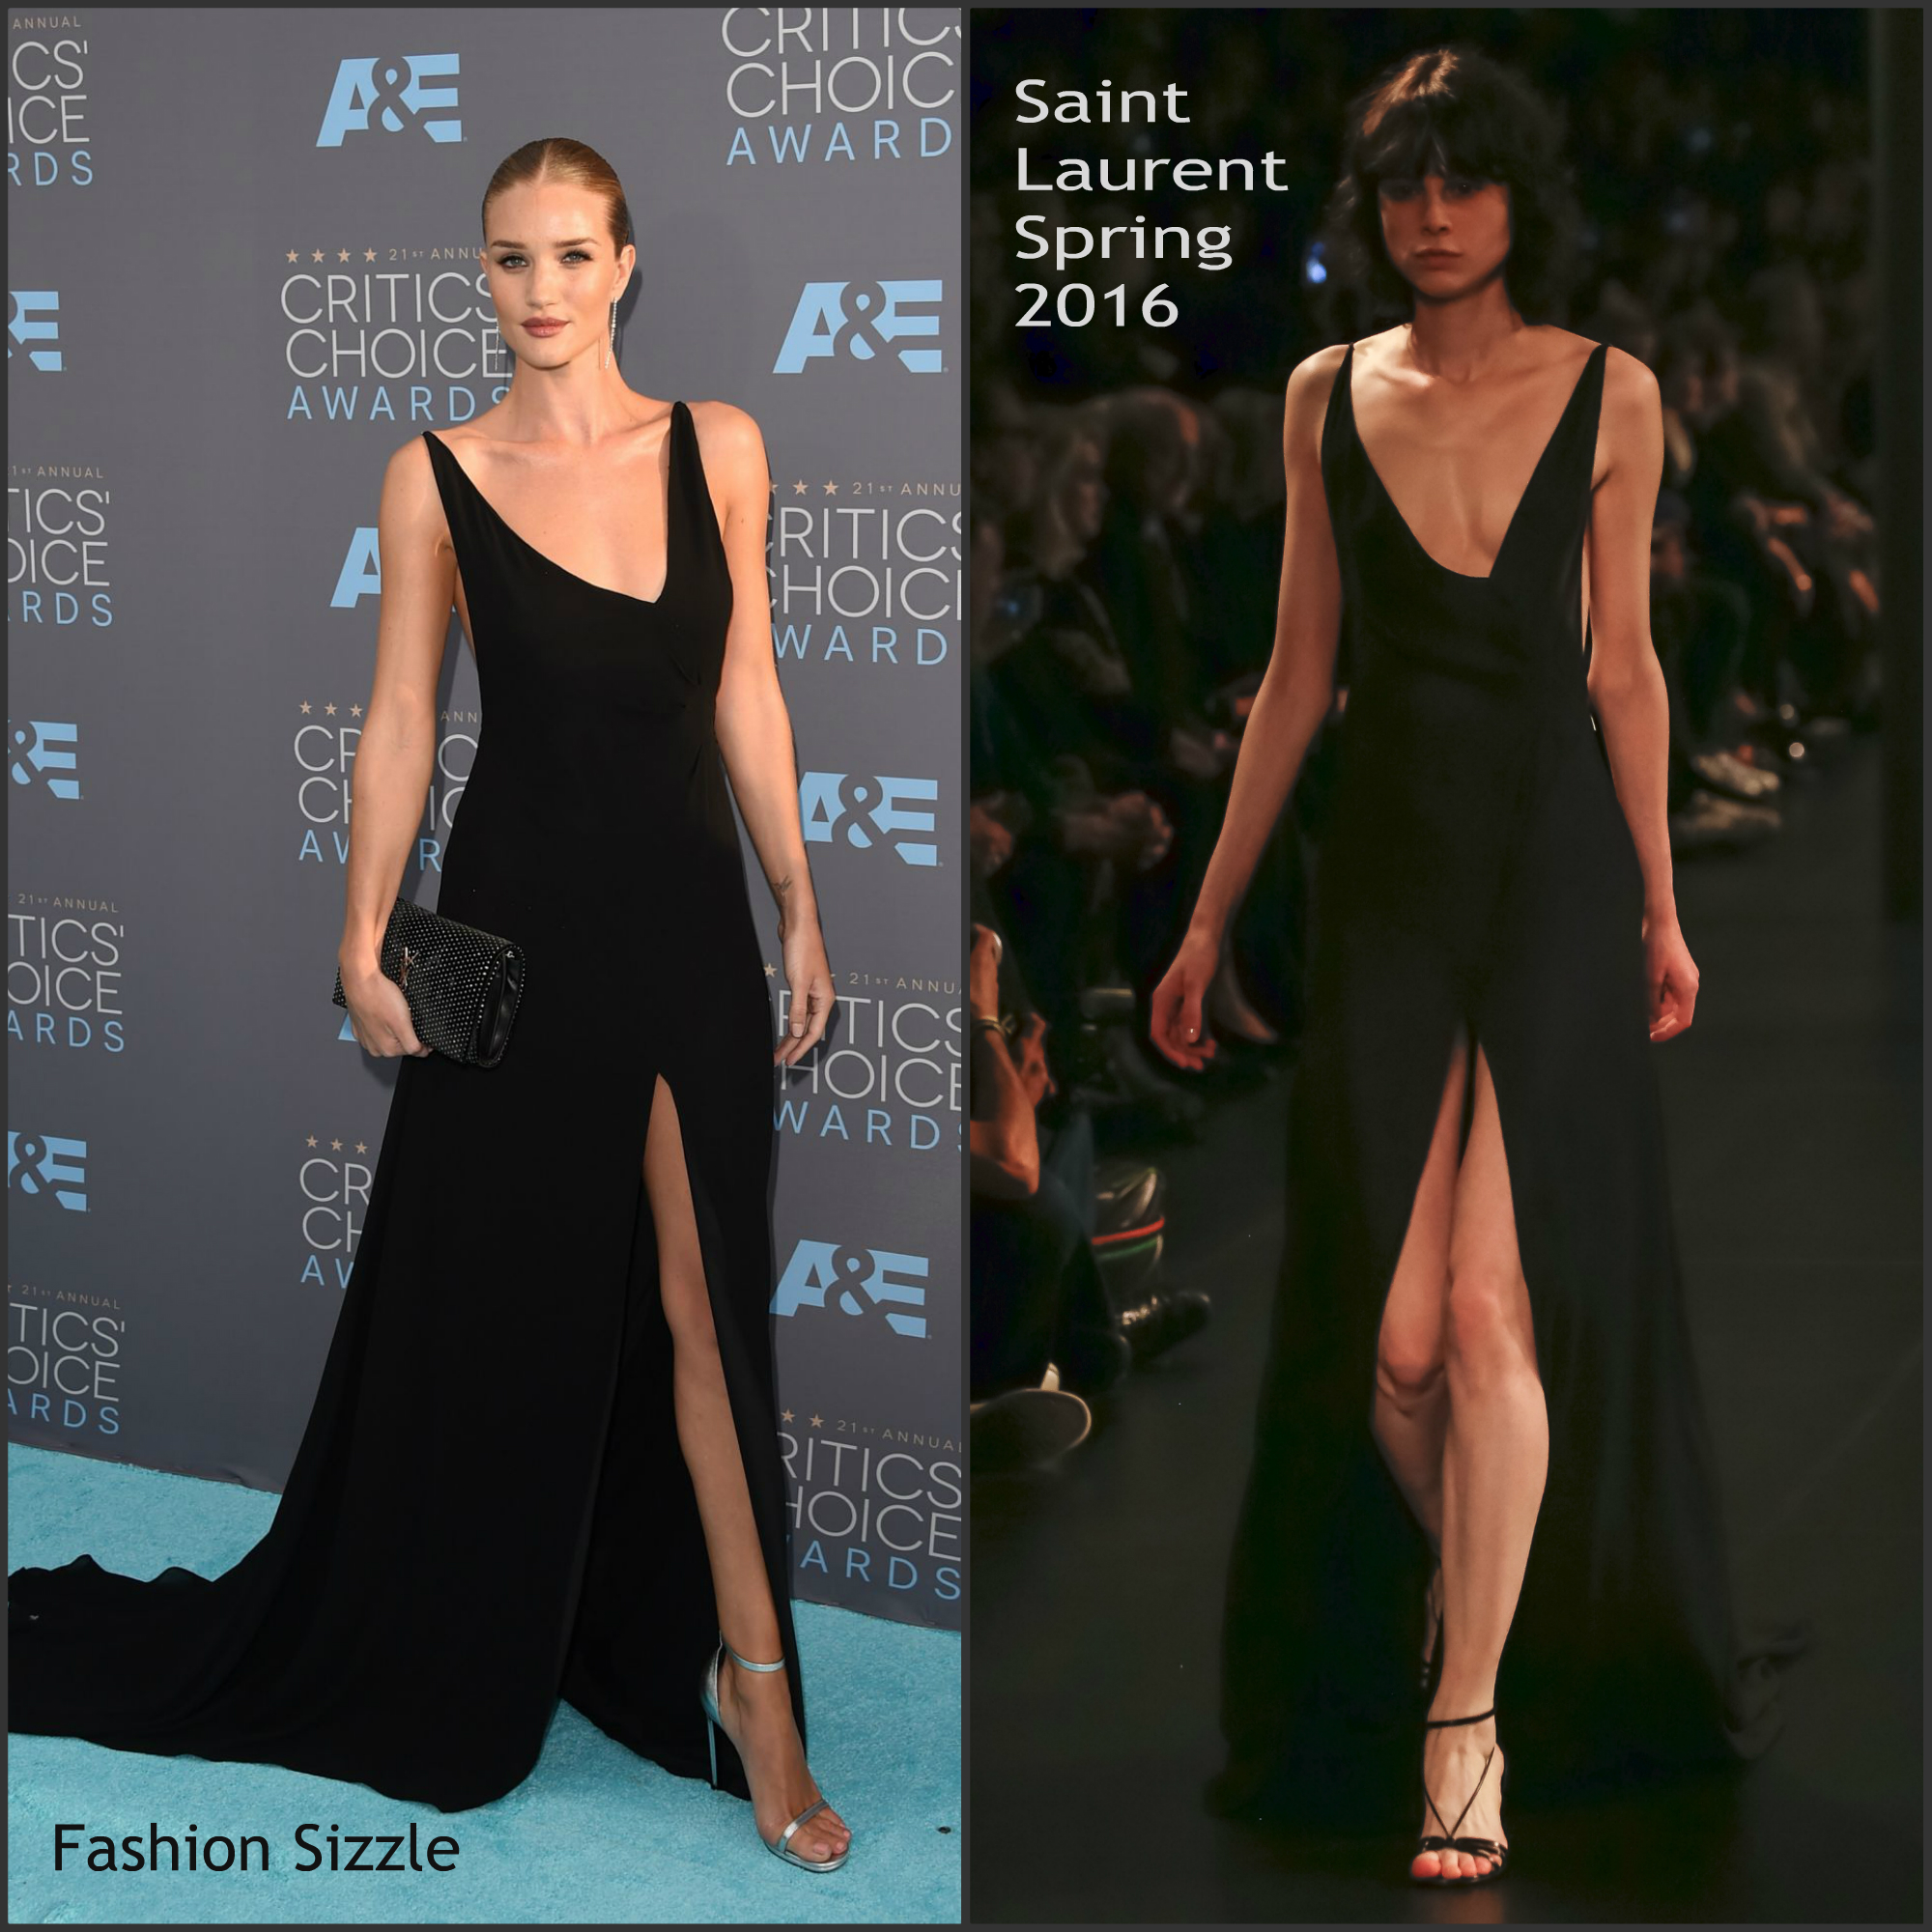 rosie-huntington-whiteley-in-saint-laurent-2016-critics-choice-awards (1)